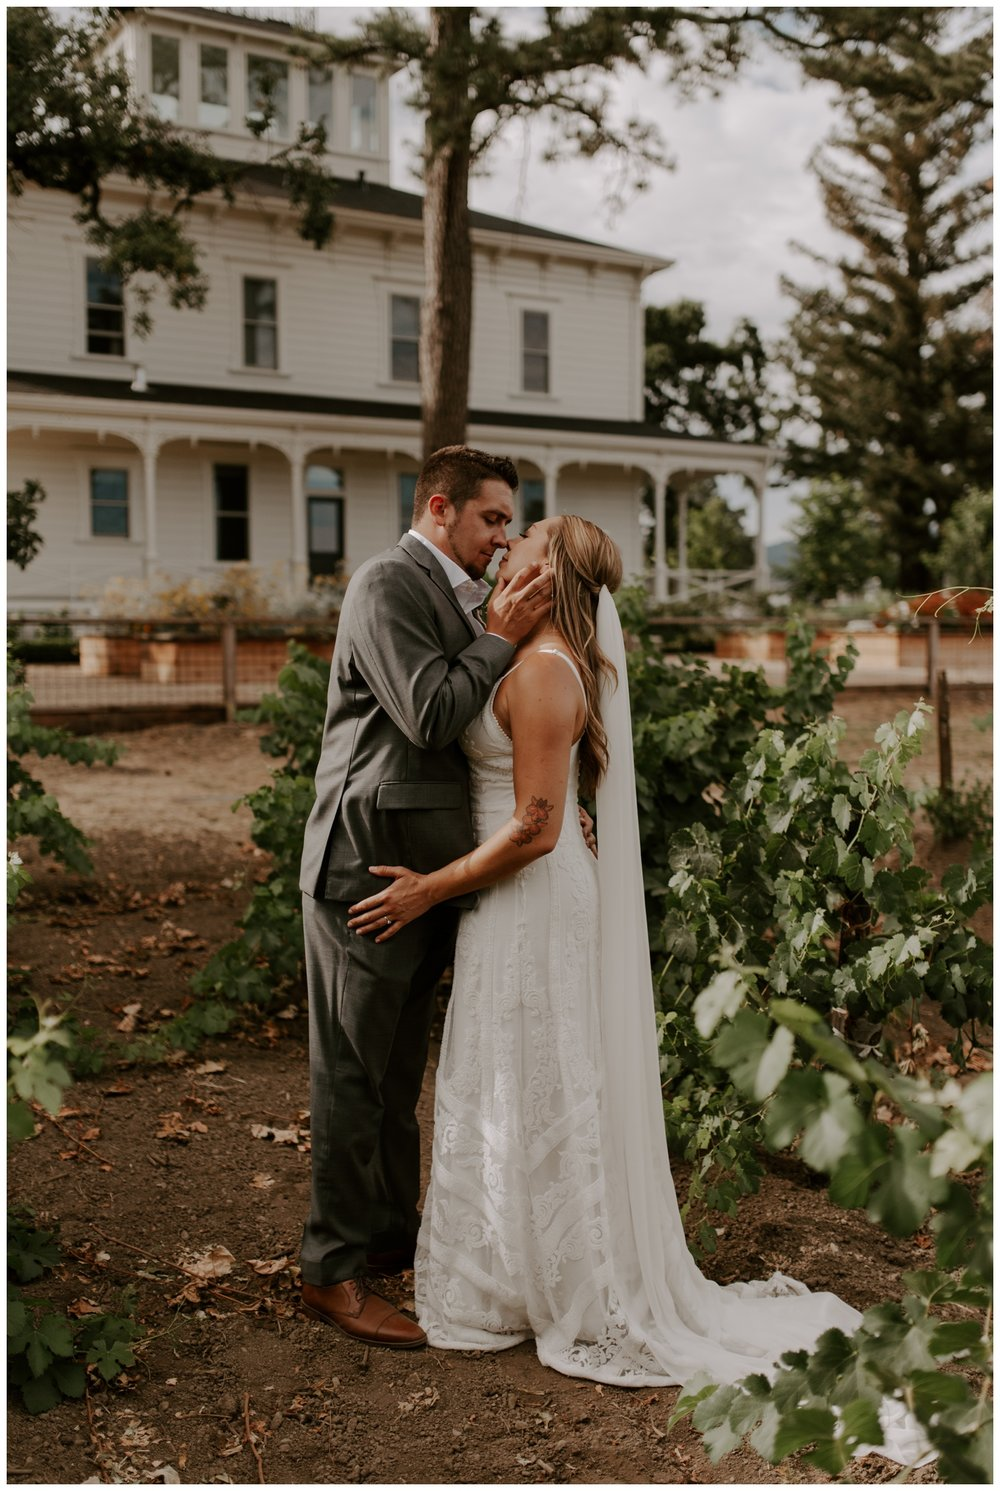 Napa Valley Backyard Wedding and Reception at Elizabeth Spencer Winery | Jessica Heron Images 120.jpg